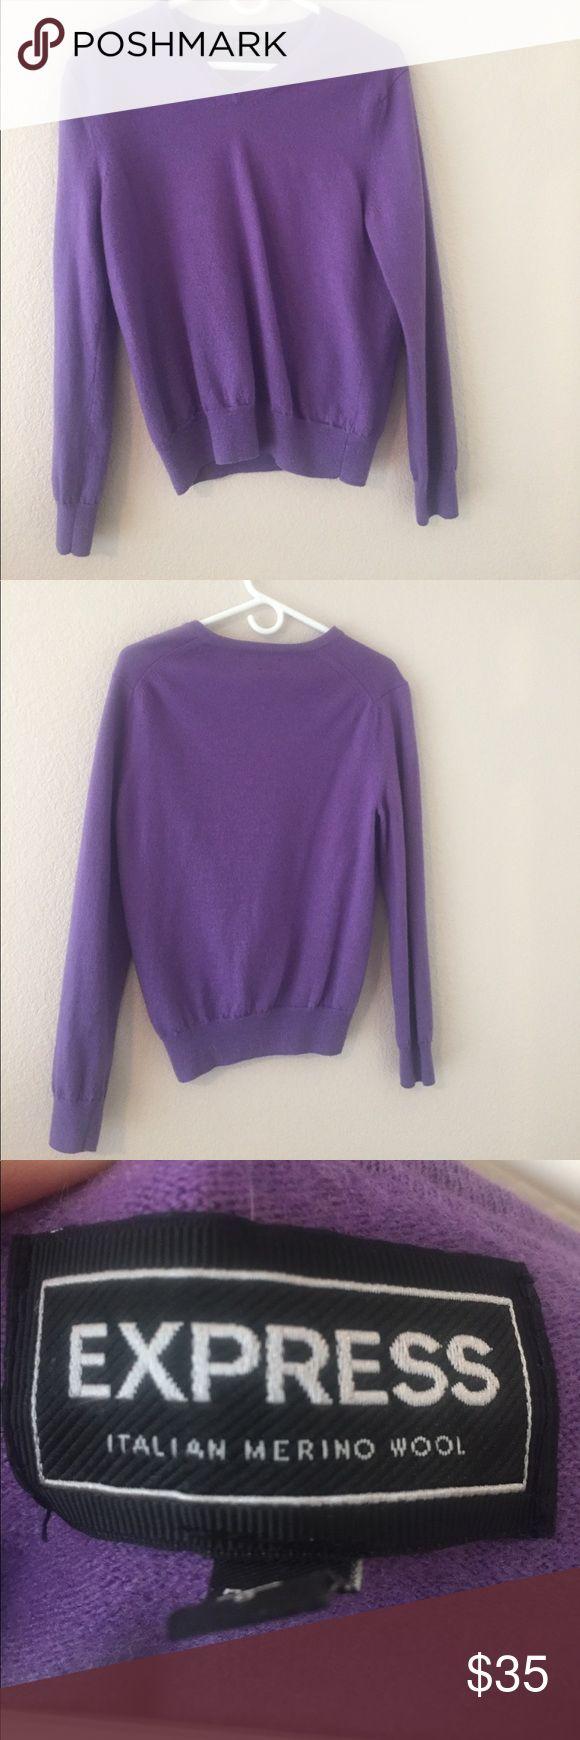 Express Italian merino wool sweater, size L Warm, purple express sweater/ Italian merino wool. In good condition. Express Sweaters V-Necks